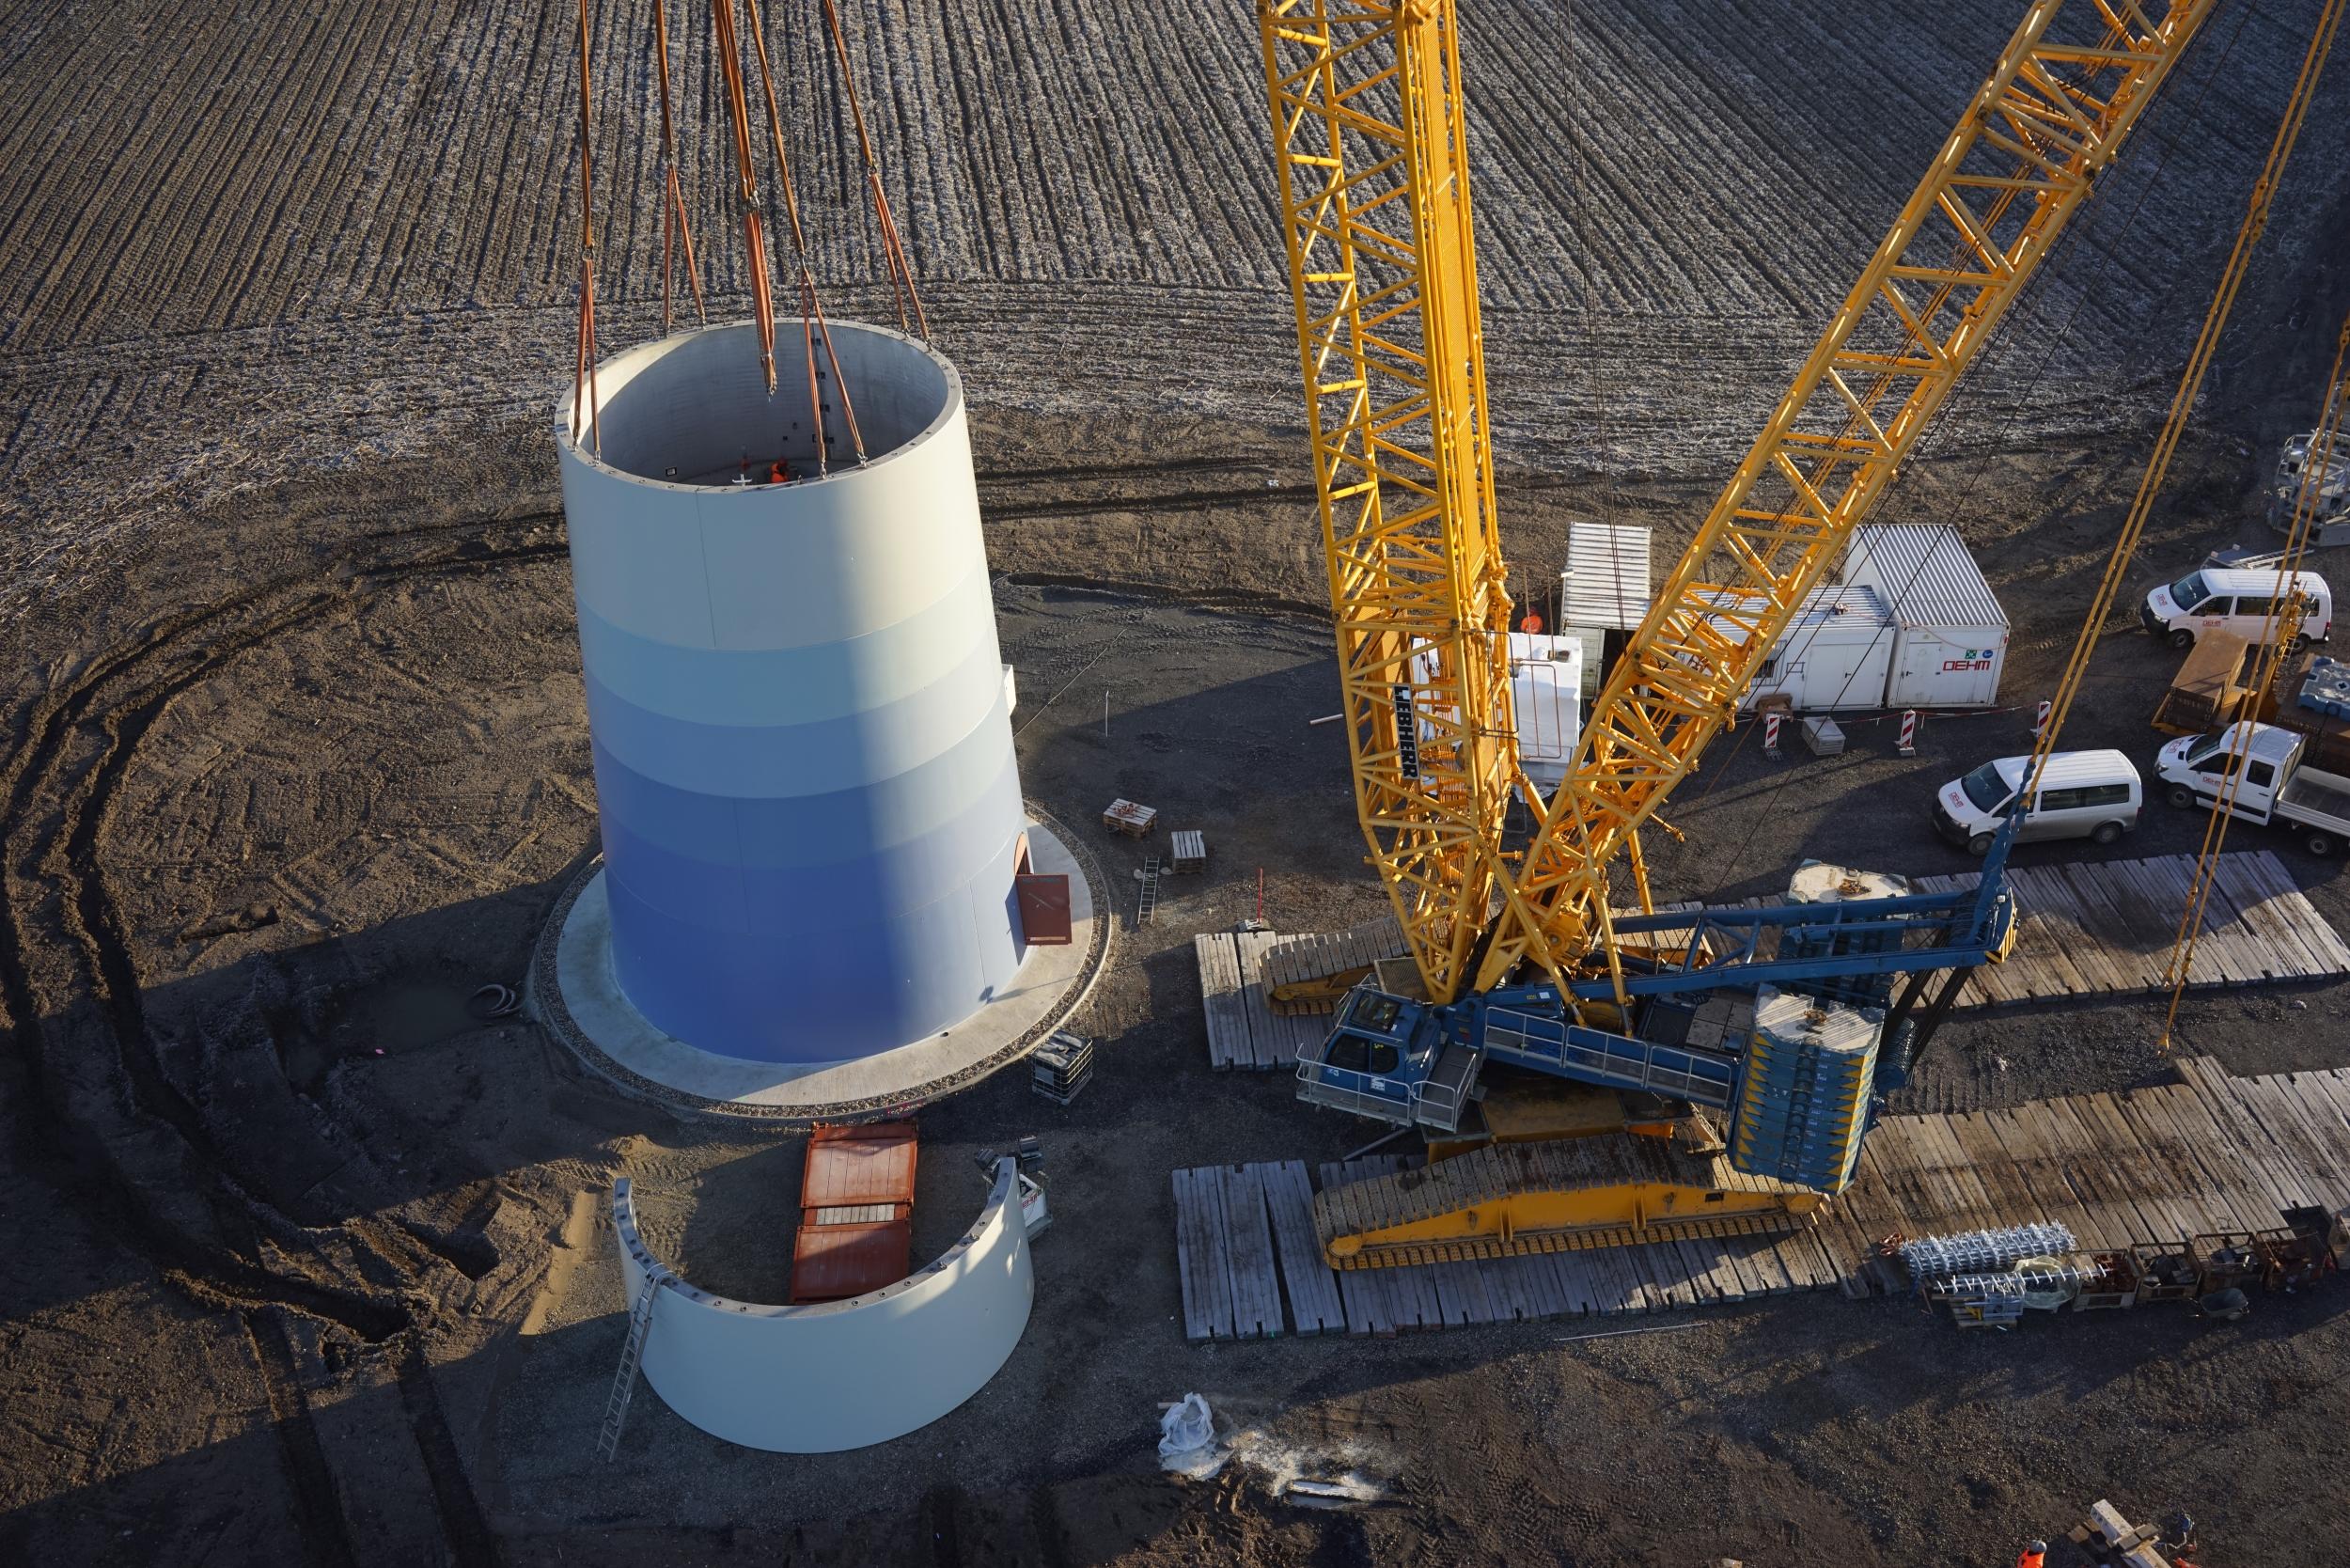 Luftbild Luftbildaufnahme UAV Drohne Flugroboter Baudokumentation Inspektion Windpark Windkraftanlage Moers NRW